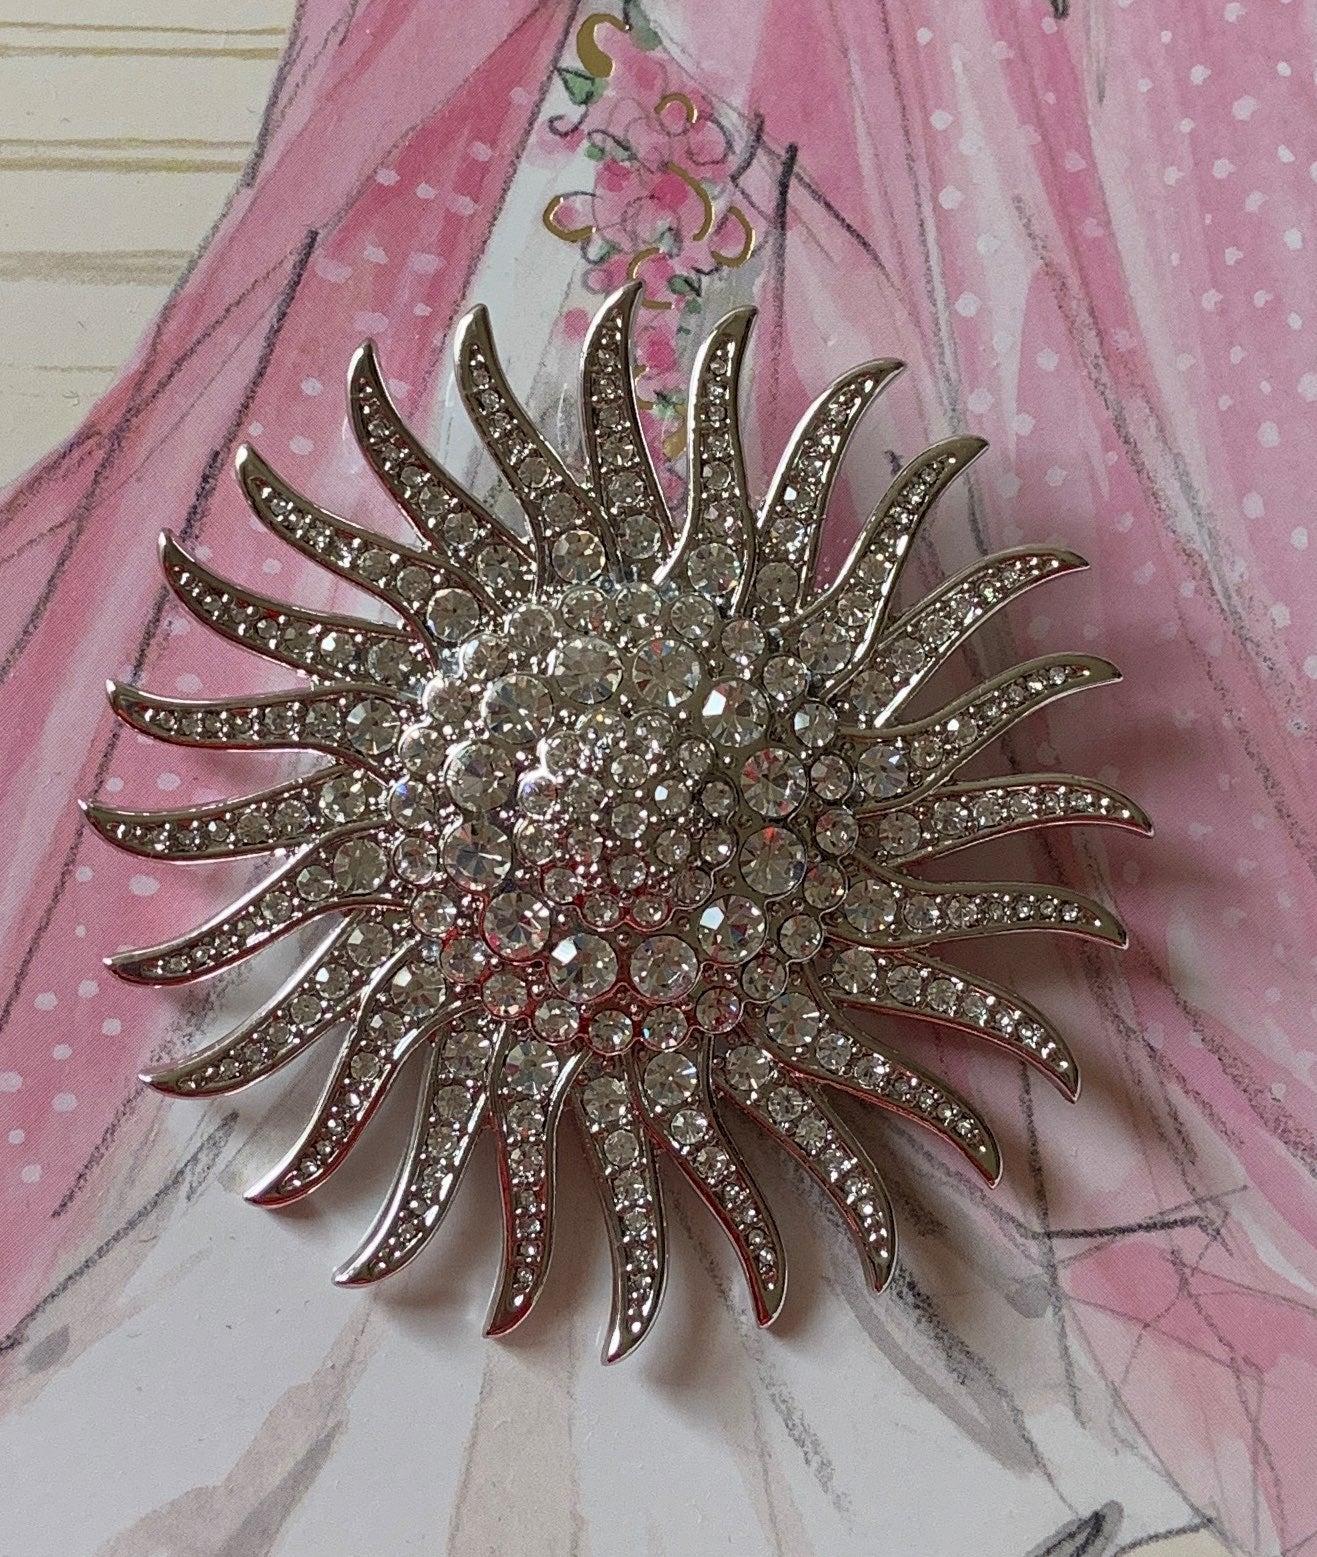 JBK Pave Crystal Starburst Brooch Pin